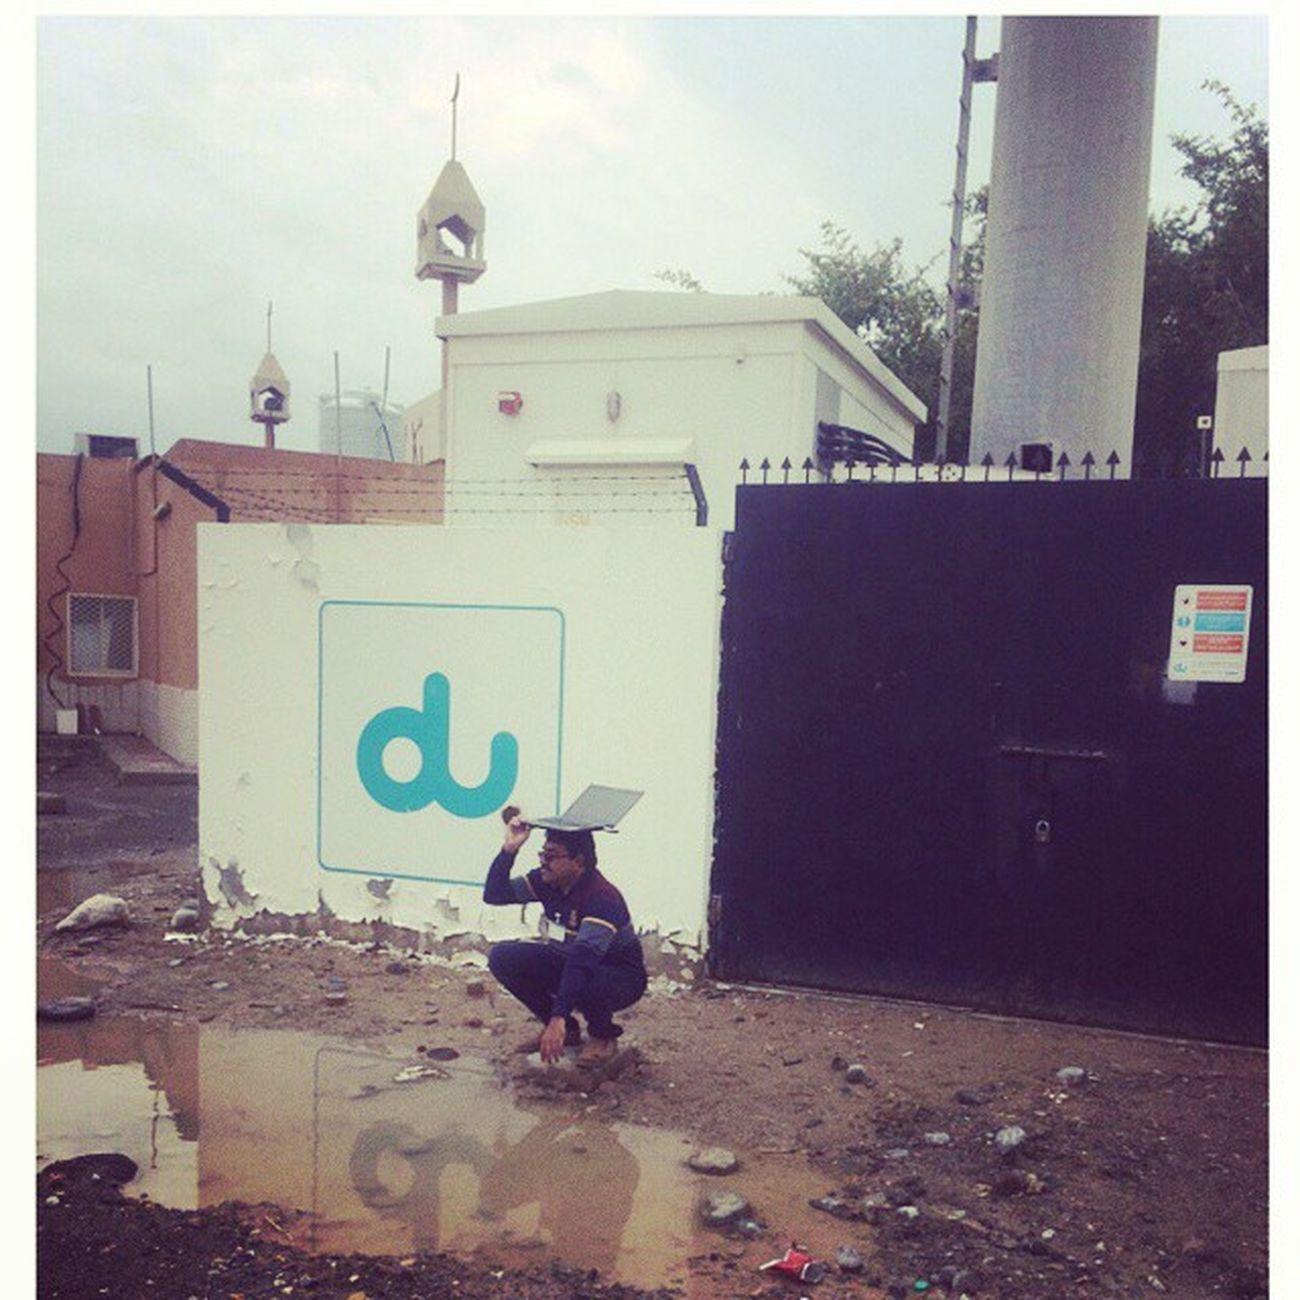 جاري البحث عن الشبكه Dubai Dubaimediaoffice Dubaitag DXB UAE Emirates Du Photo Rak Press